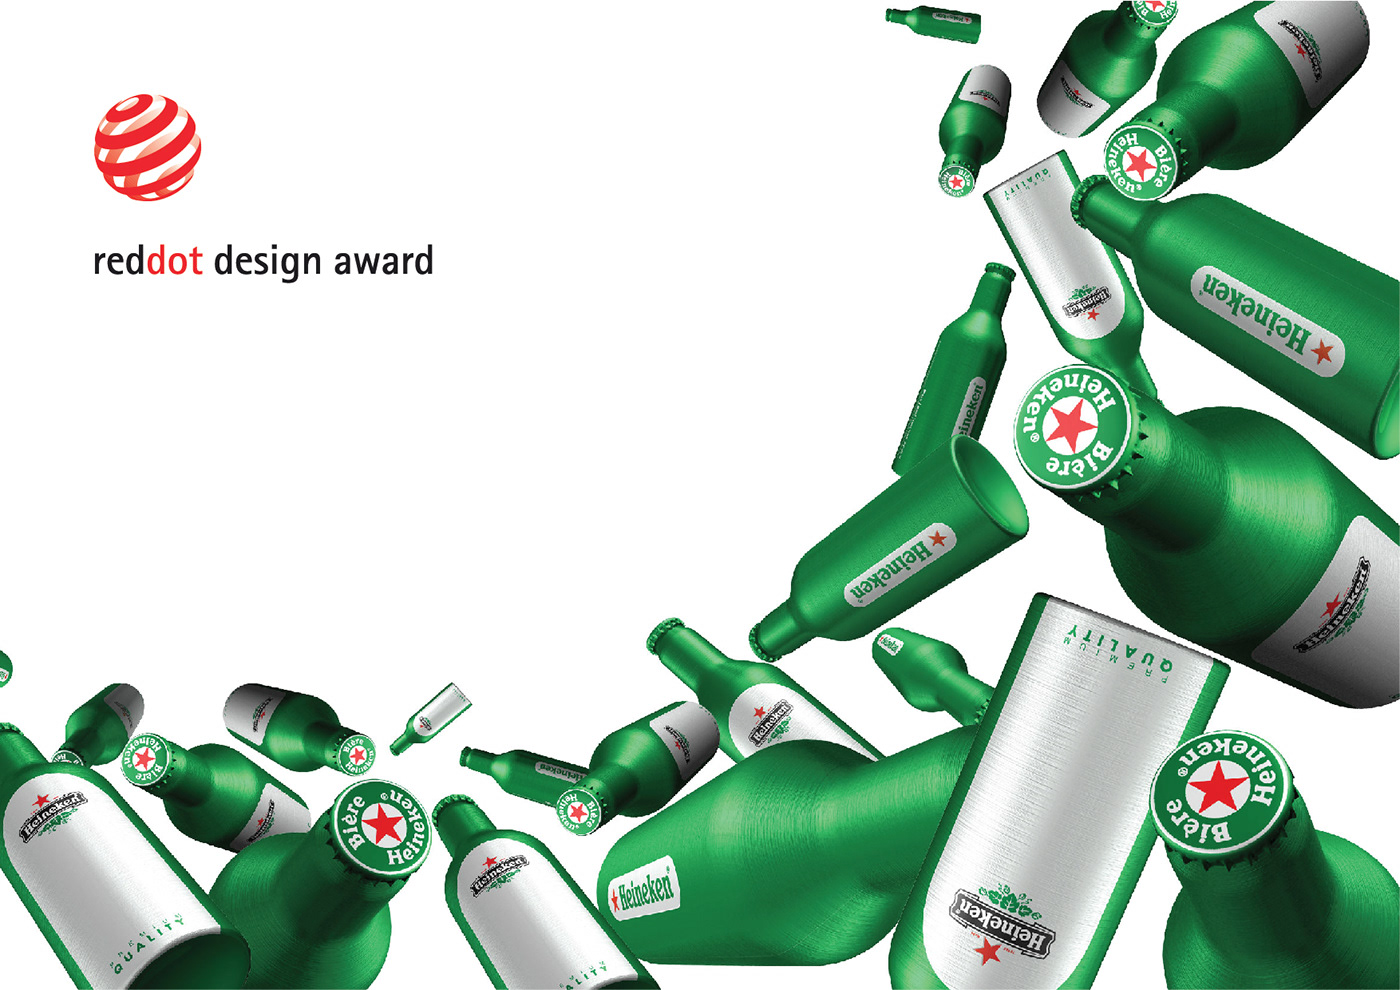 packaging design heineken beverage graphic design  beer bottle aluminium beer bottle limited edition